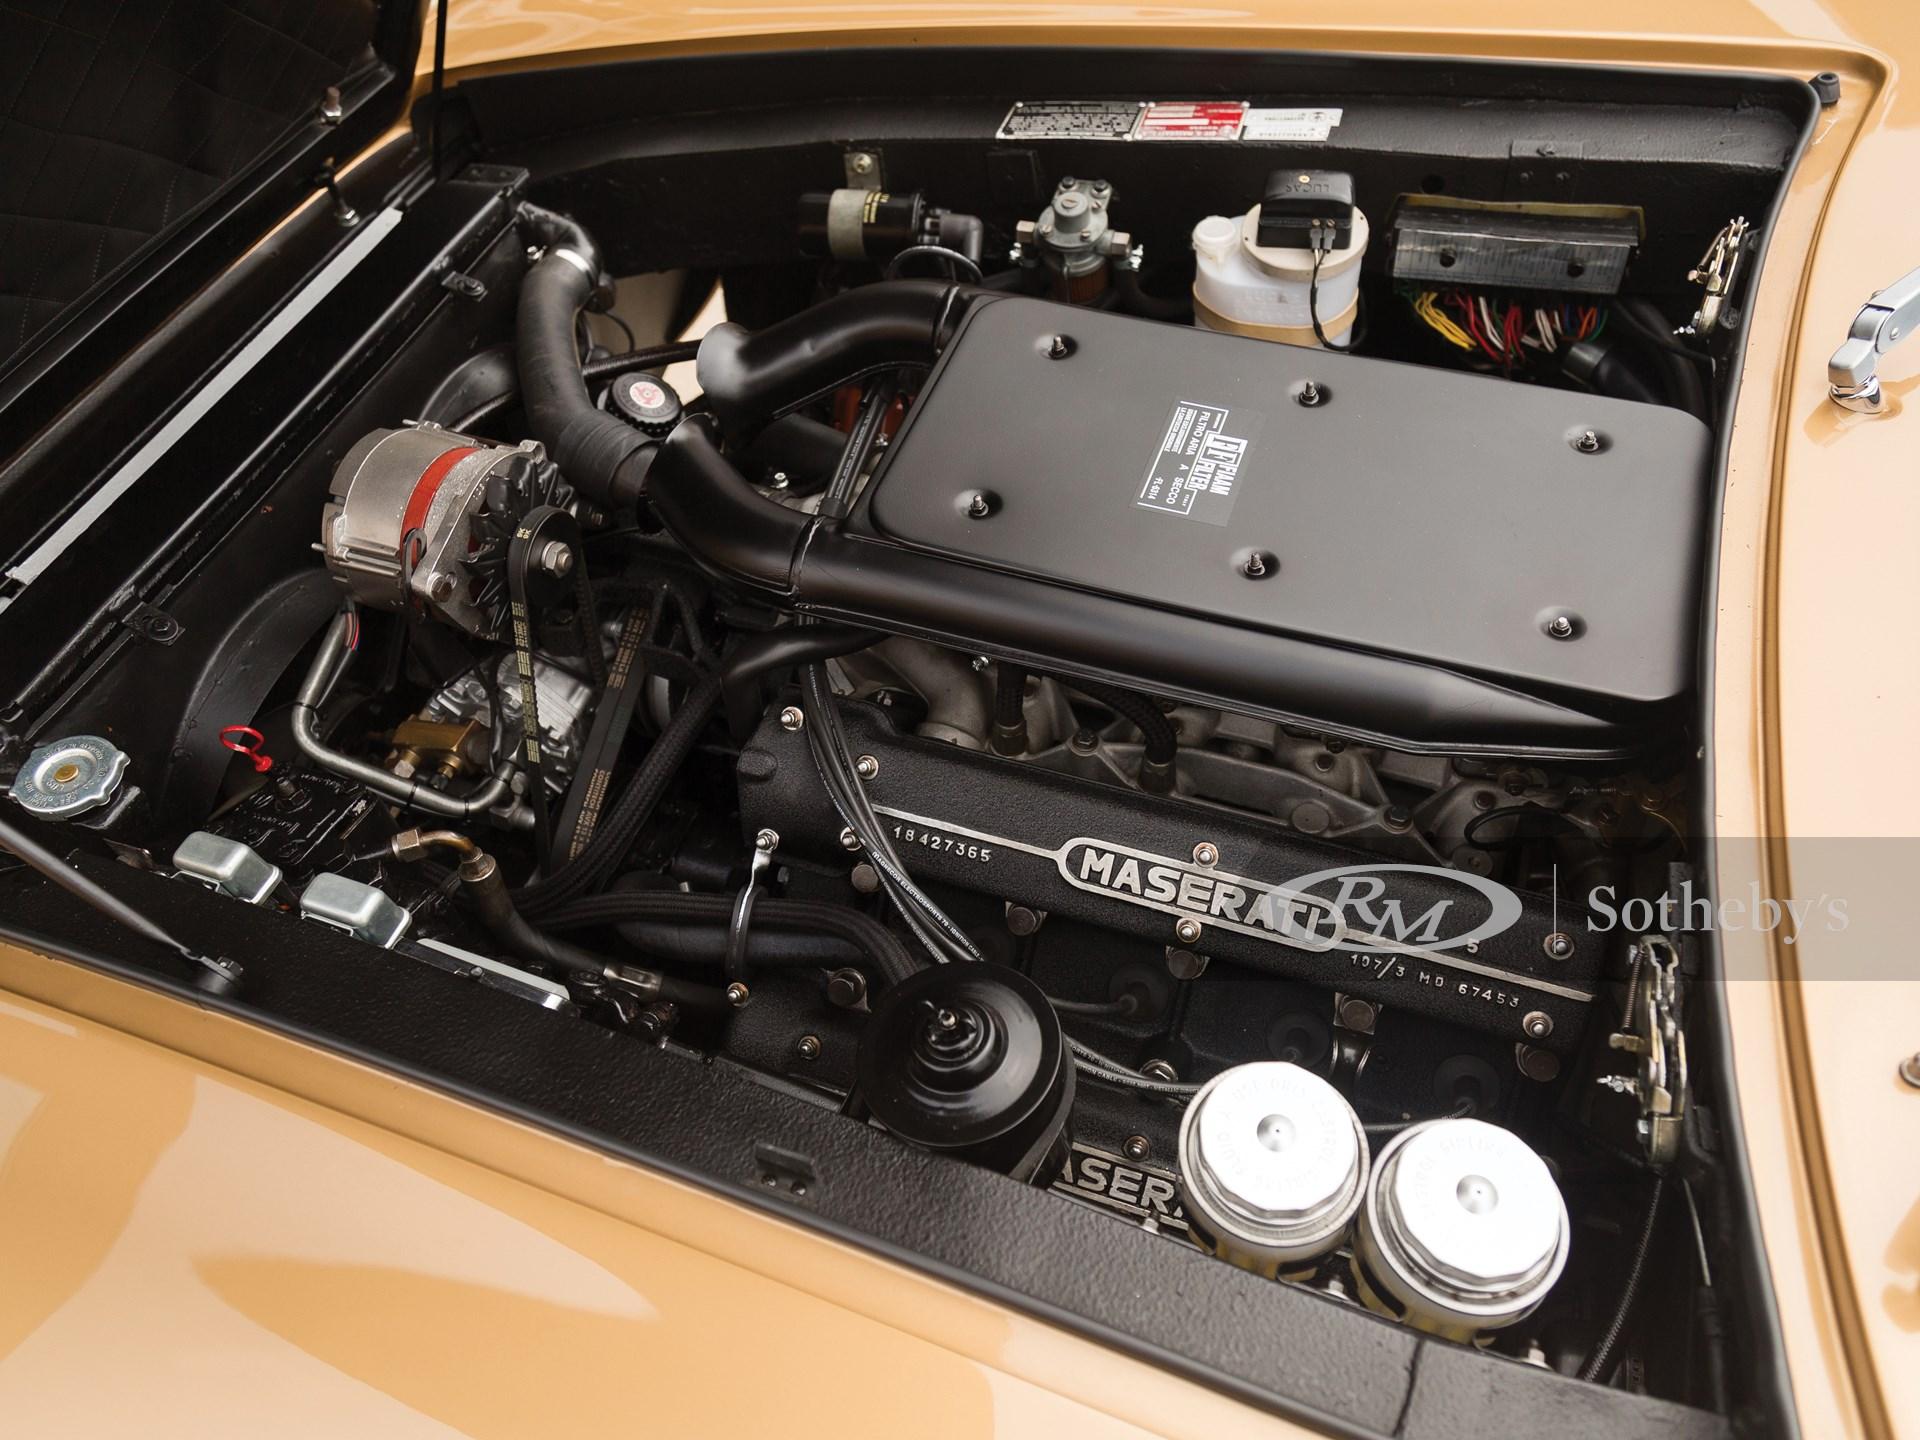 1972 Maserati Ghibli SS 4.9 Coupe by Ghia -